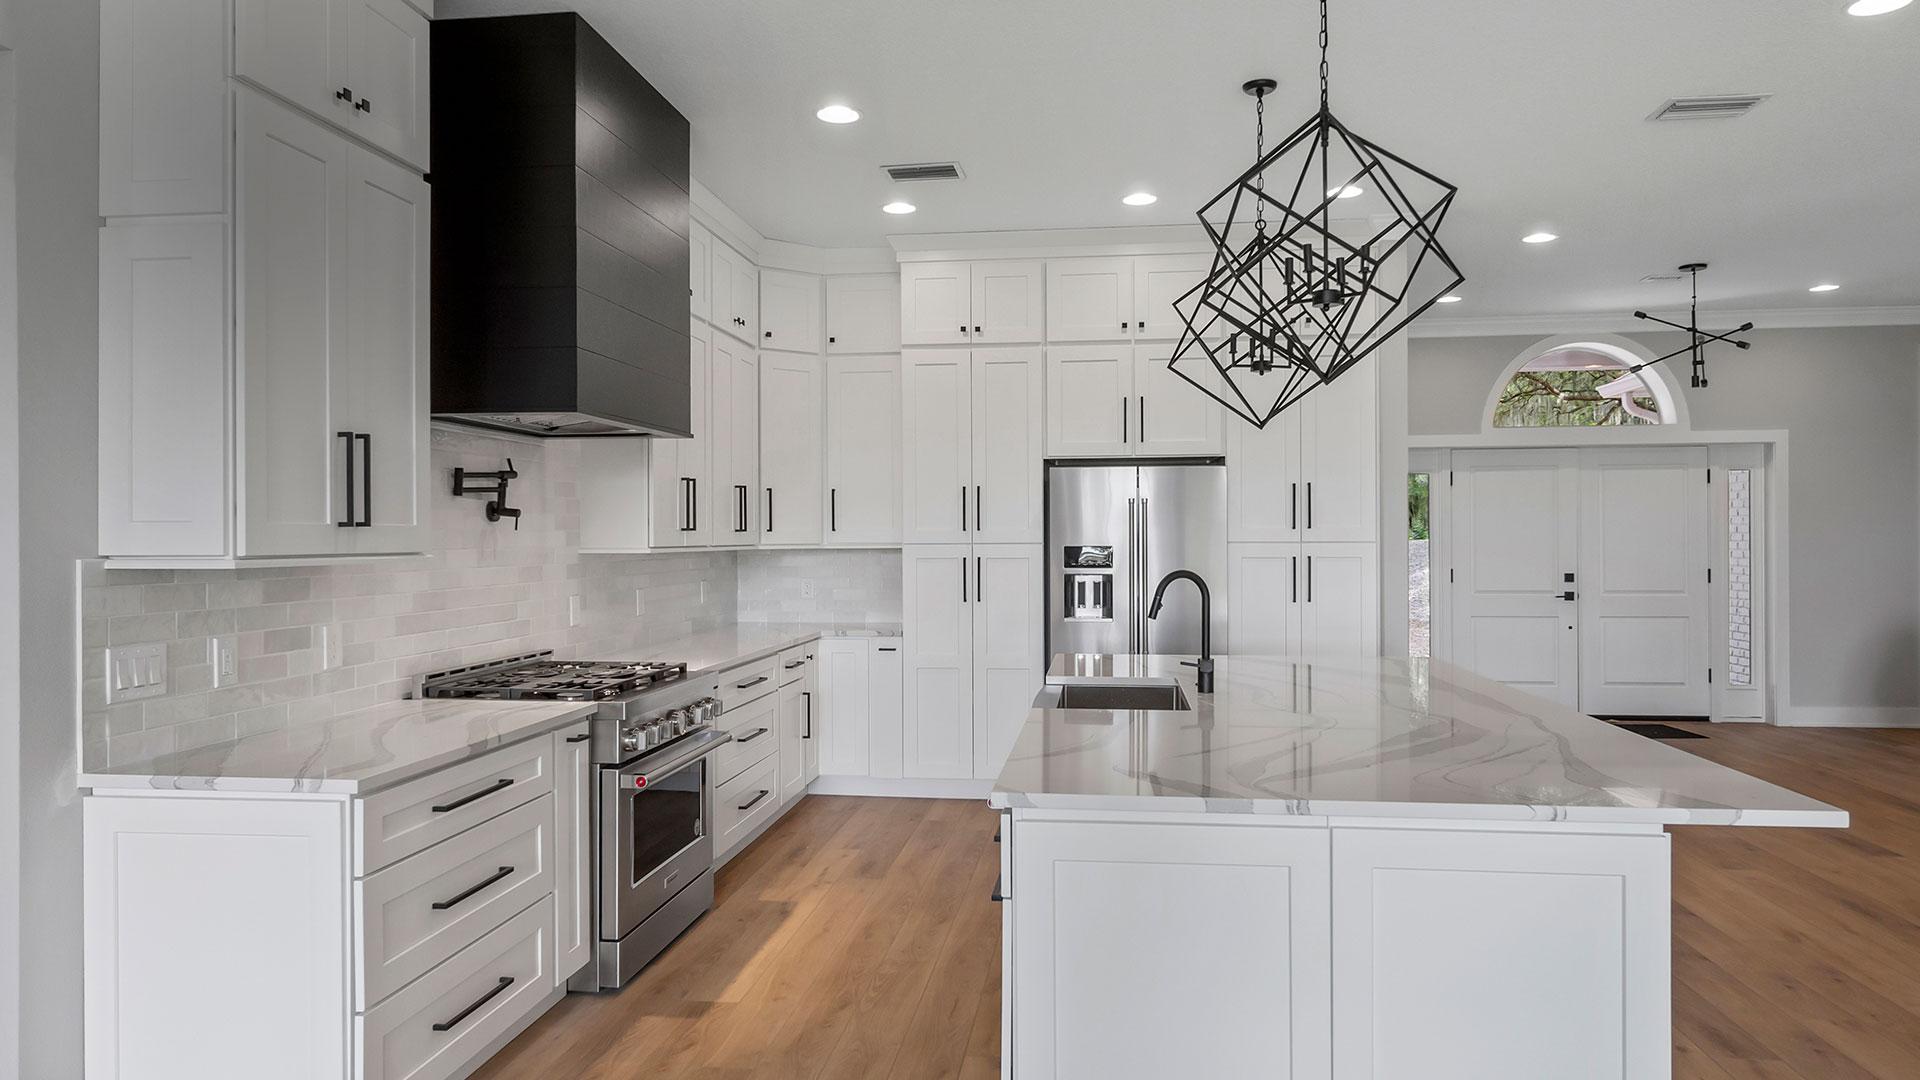 Kitchen remodel by Boulder Construction